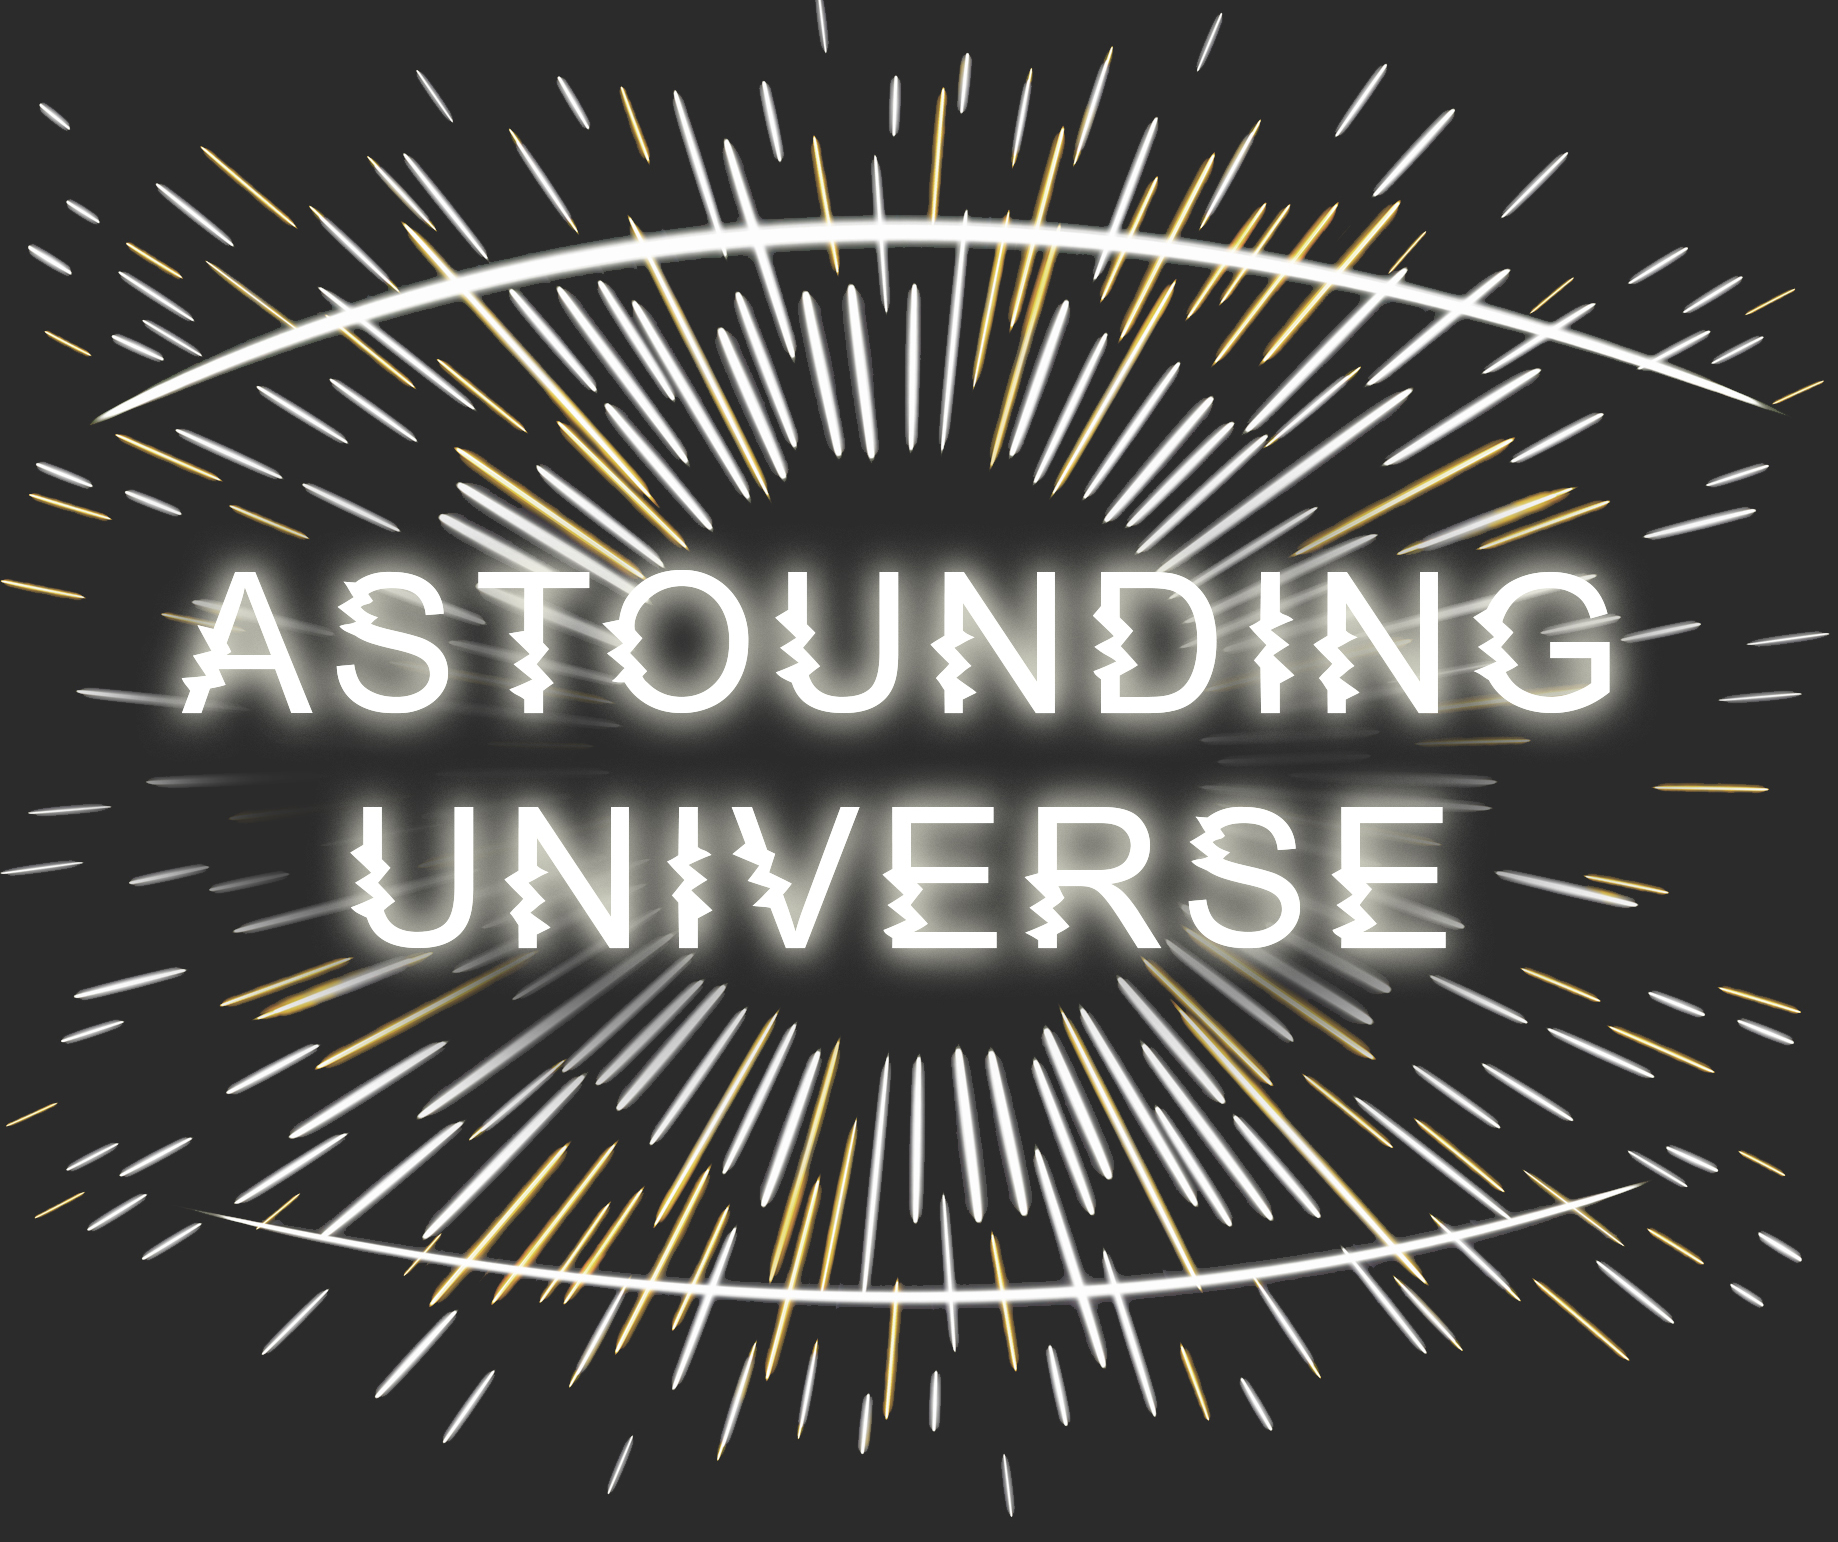 Astounding Universe.jpg